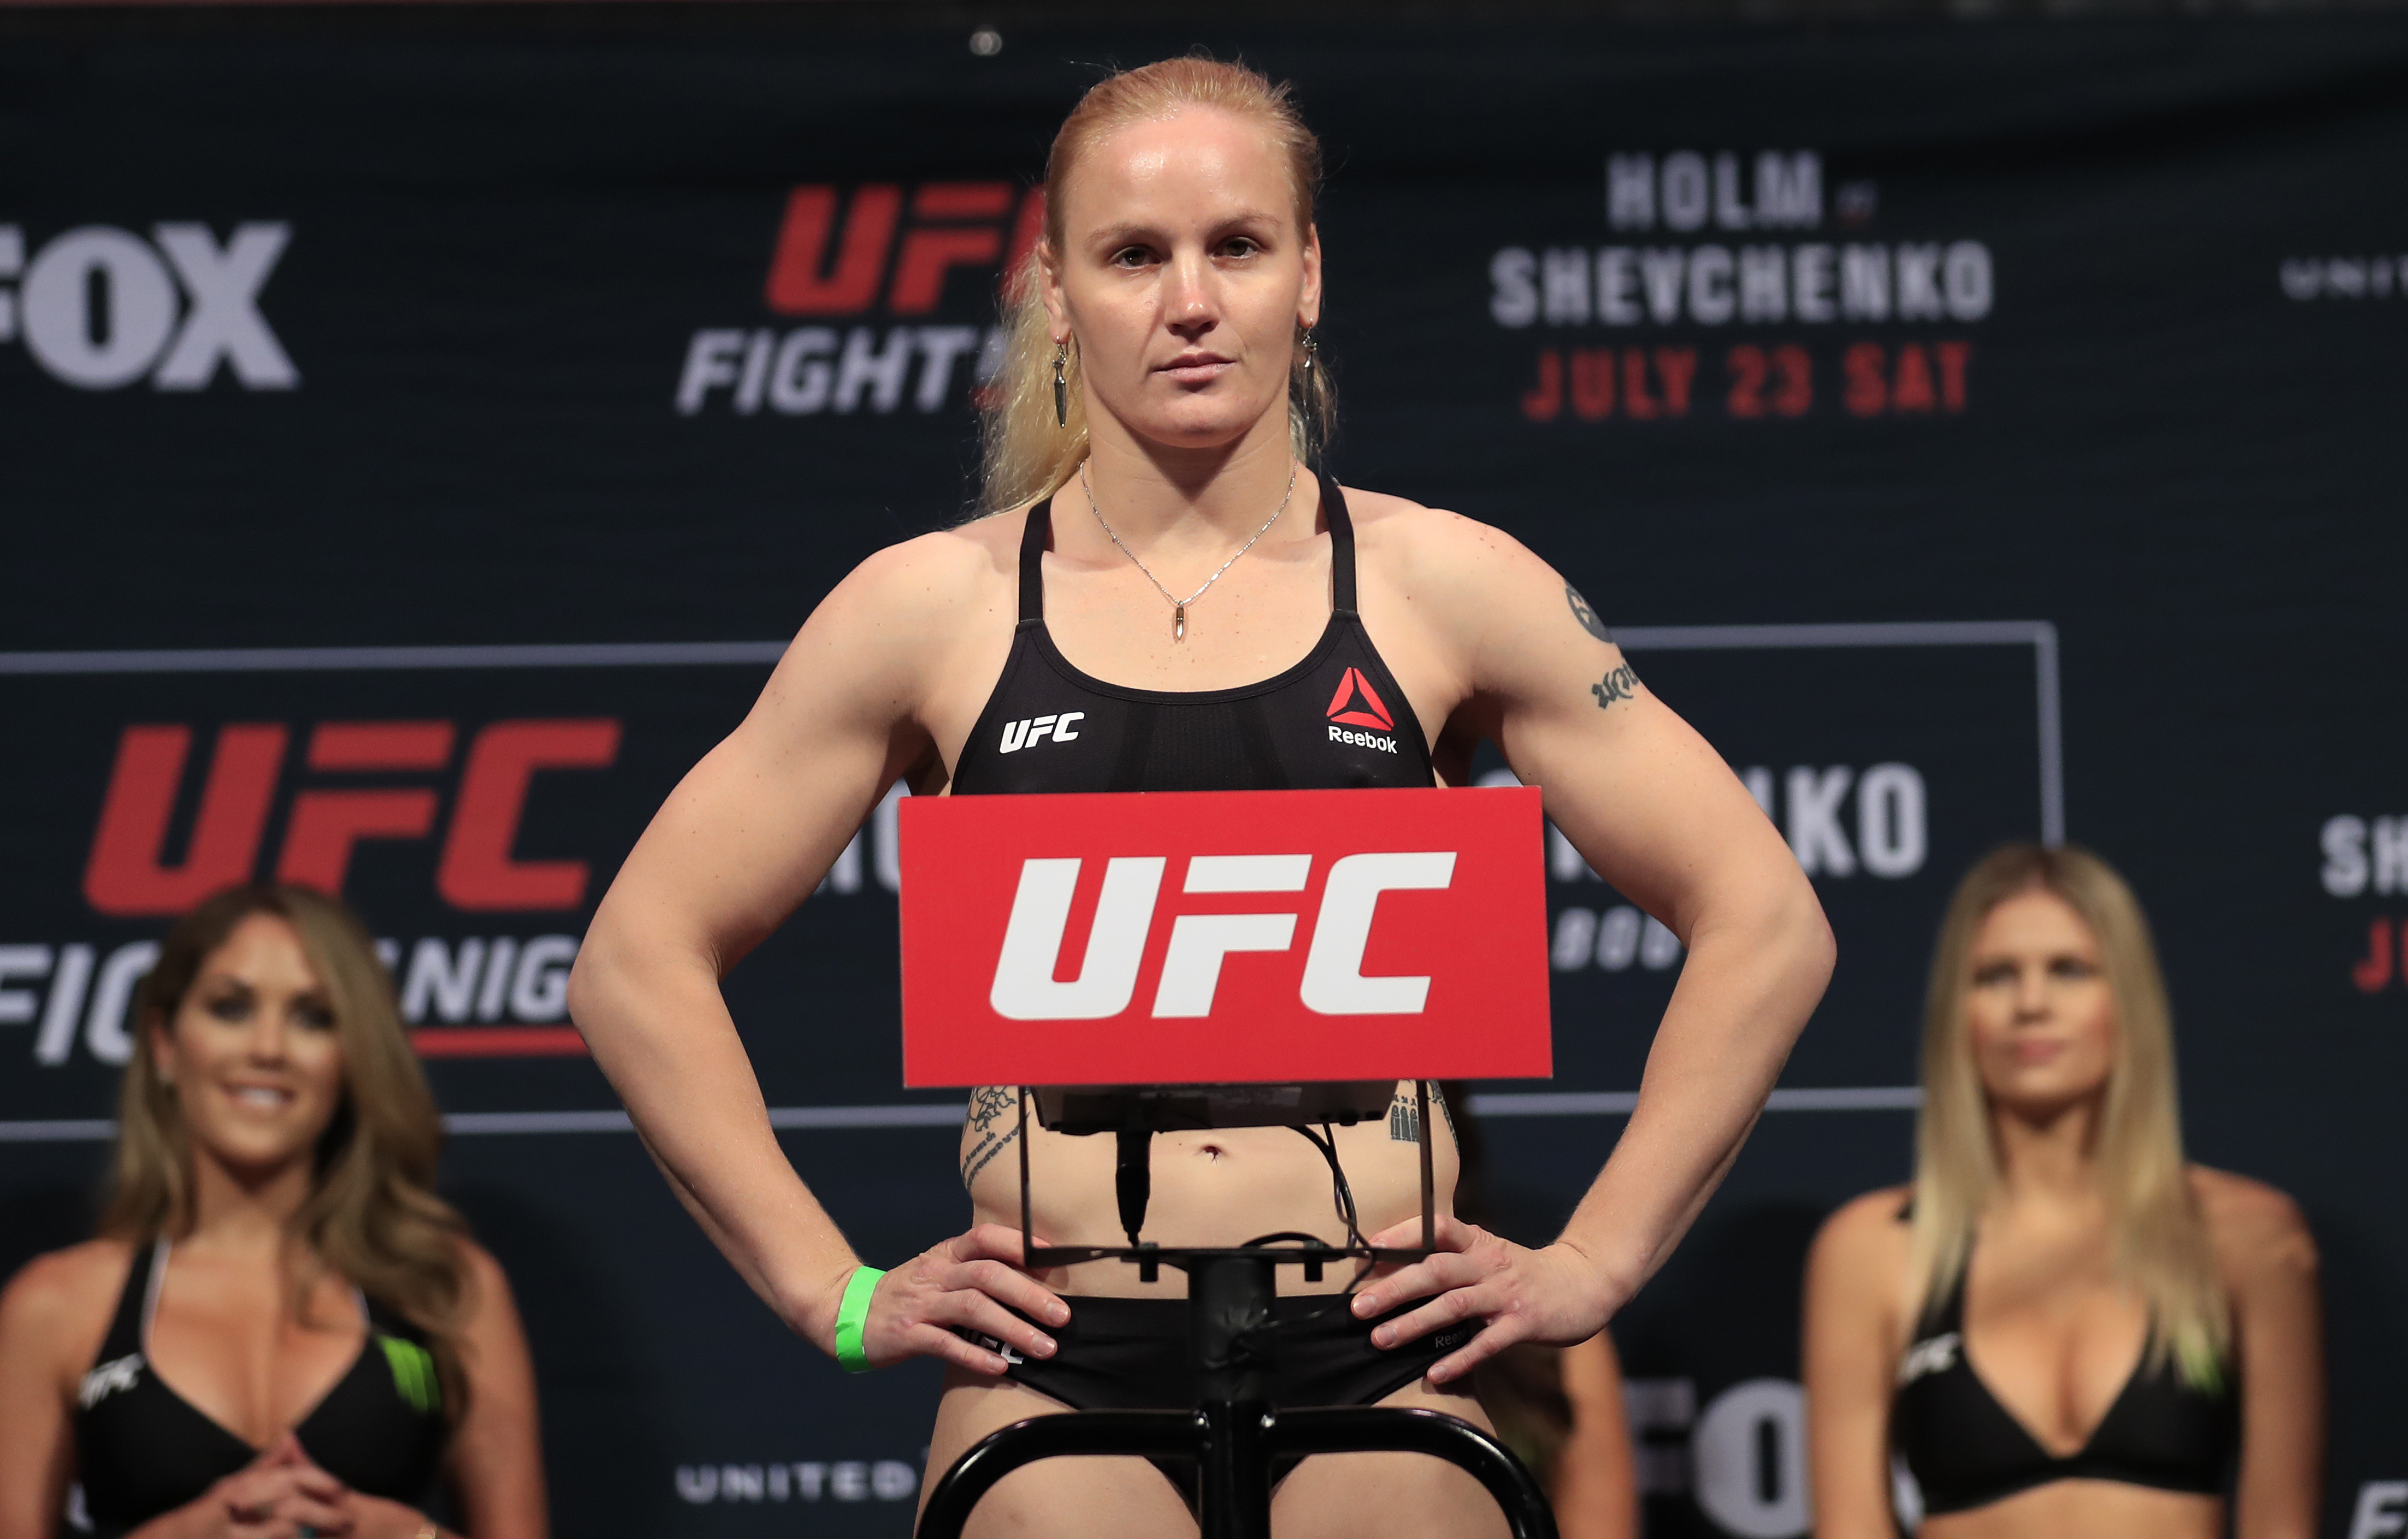 MMA: UFC Fight Night-Holm vs Shevchenko-Weigh Ins